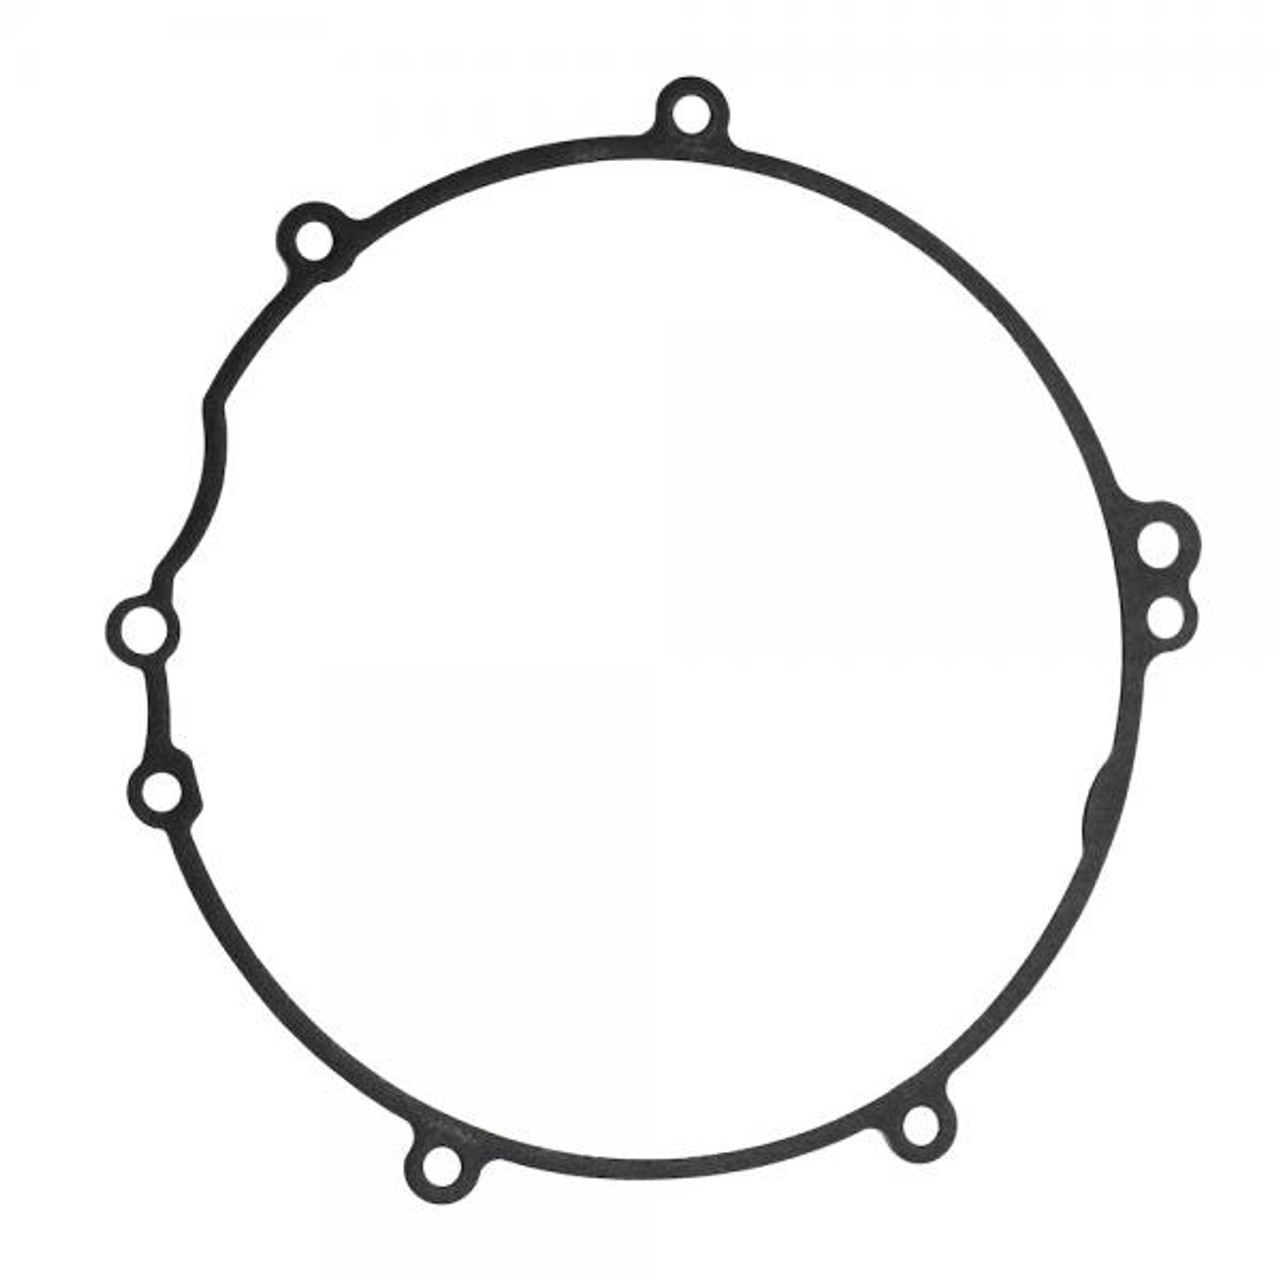 Clutch cover gasket metal 0.6mm